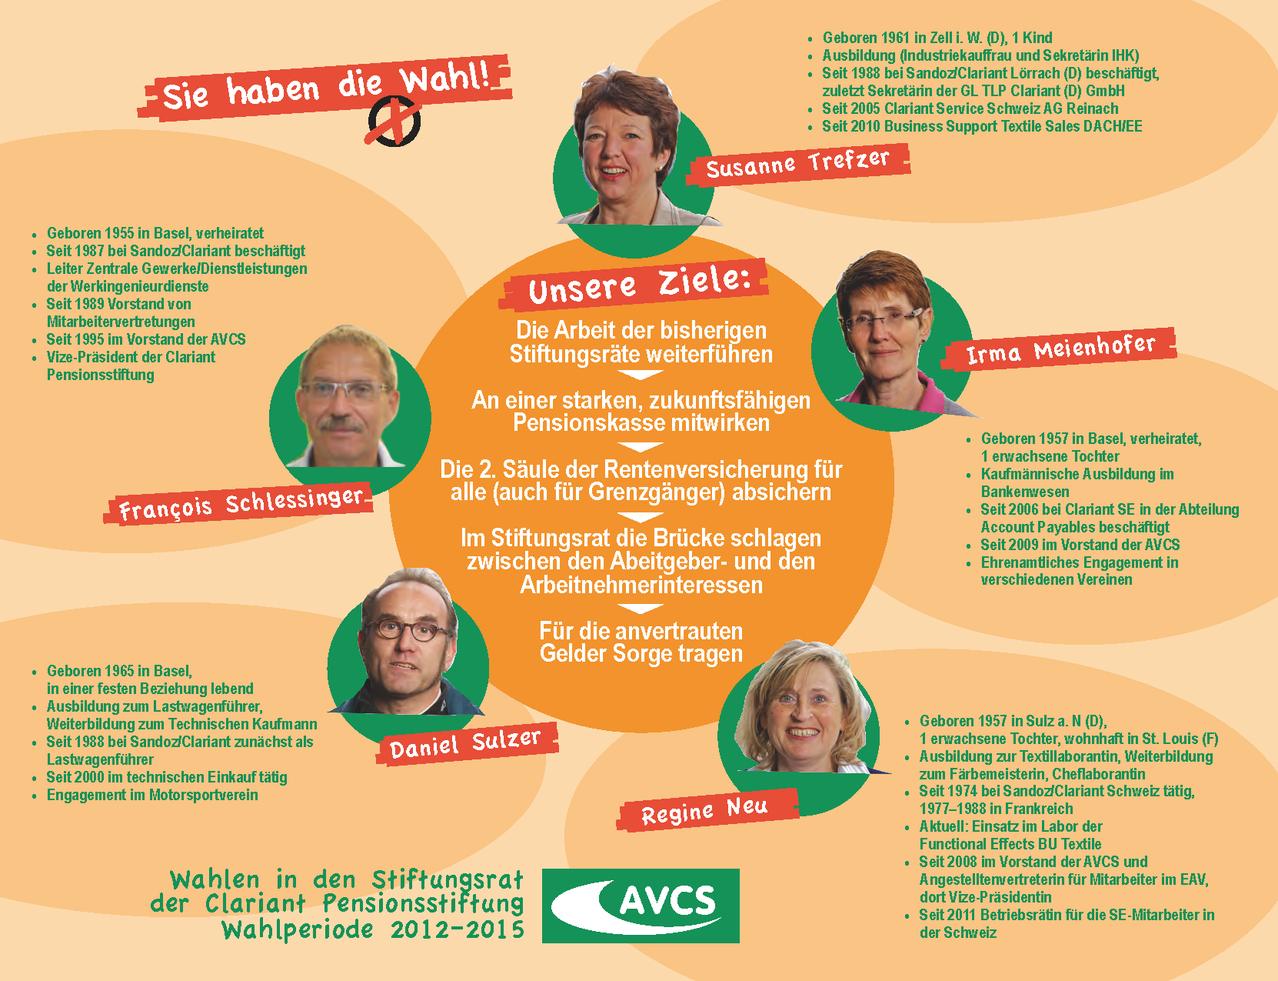 AVCS Clariant - TEXTgehext Ellen Haubrichs